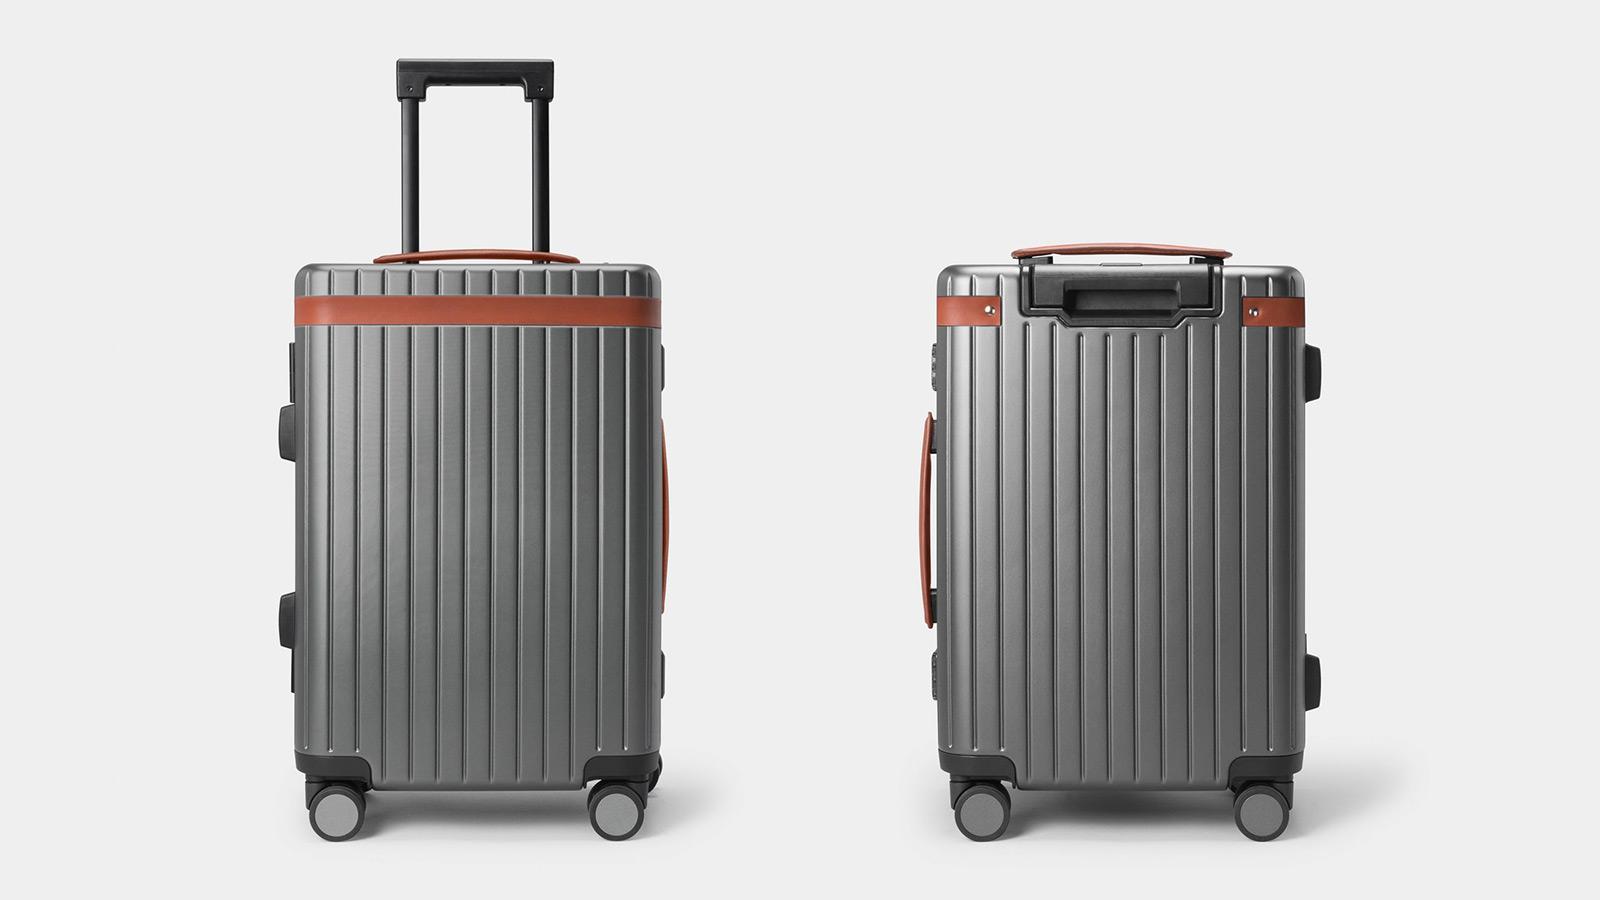 Carl Fredrik Carry-On Luggage